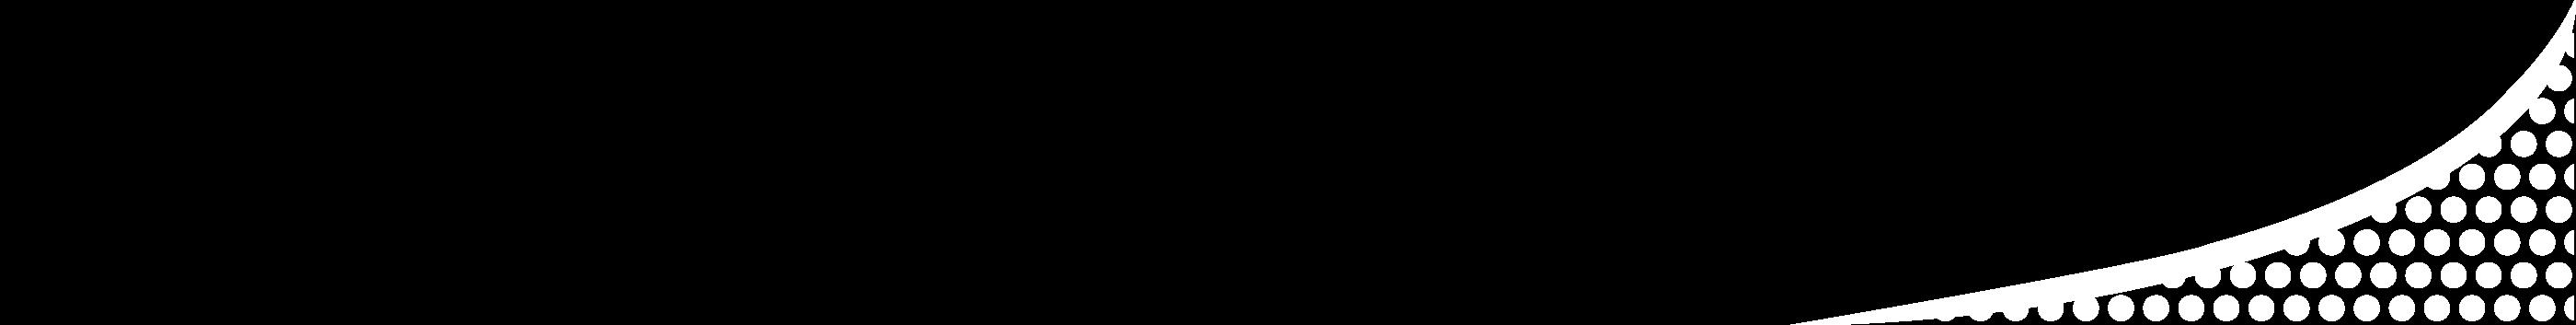 parte-sotto-ombra